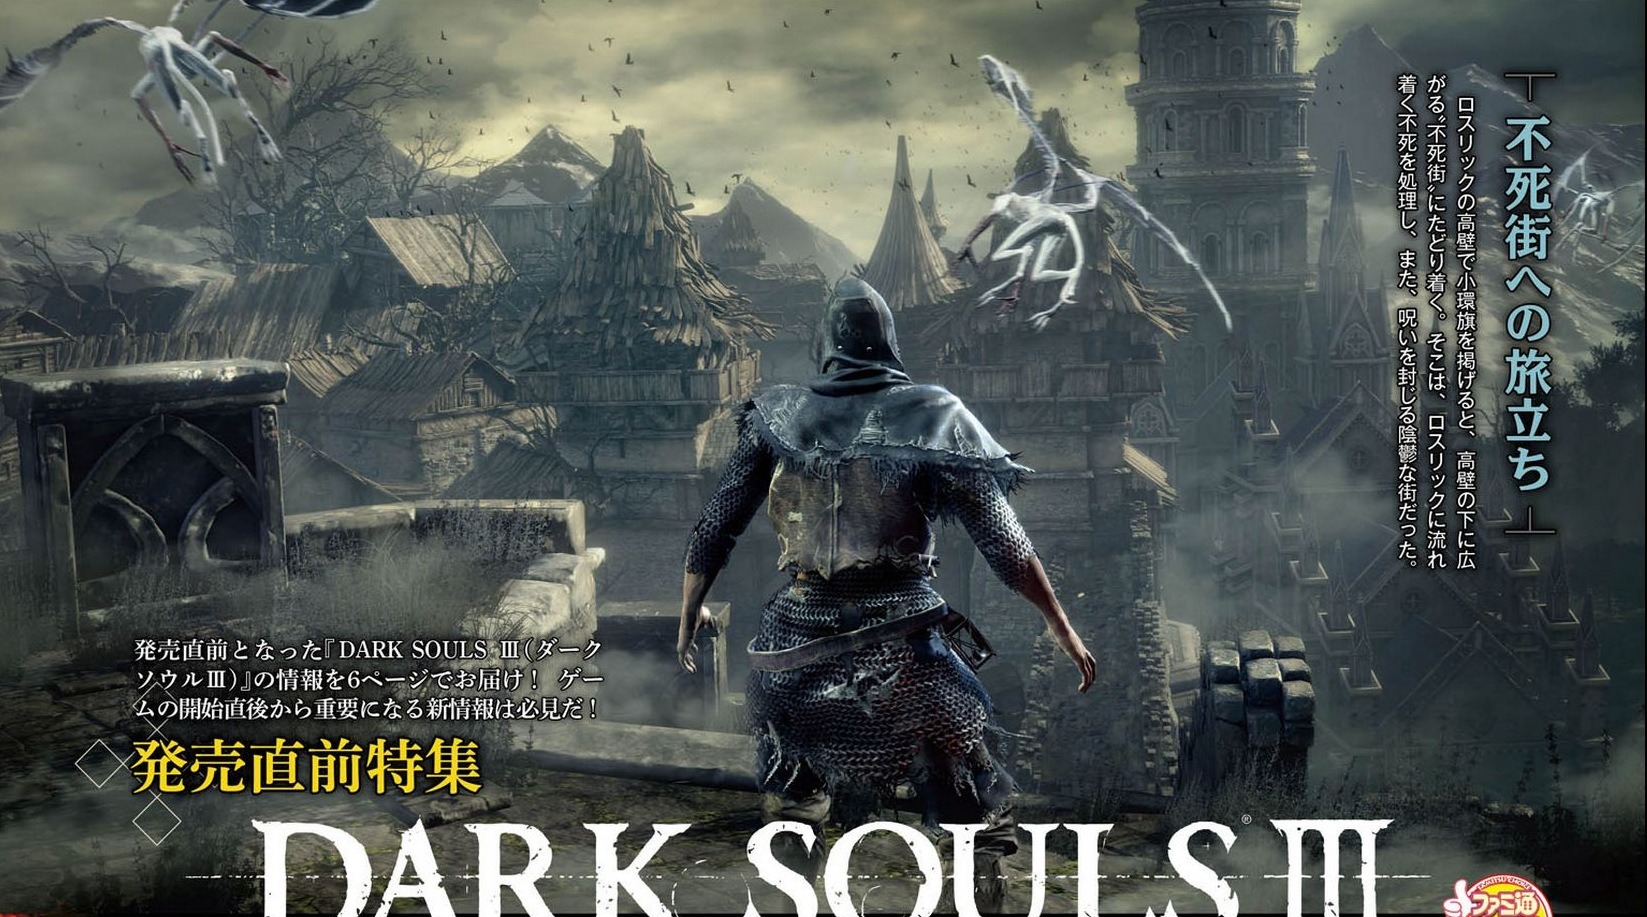 dark souls 3 GamingBoltcom Video Game News Reviews Previews and 1647x917